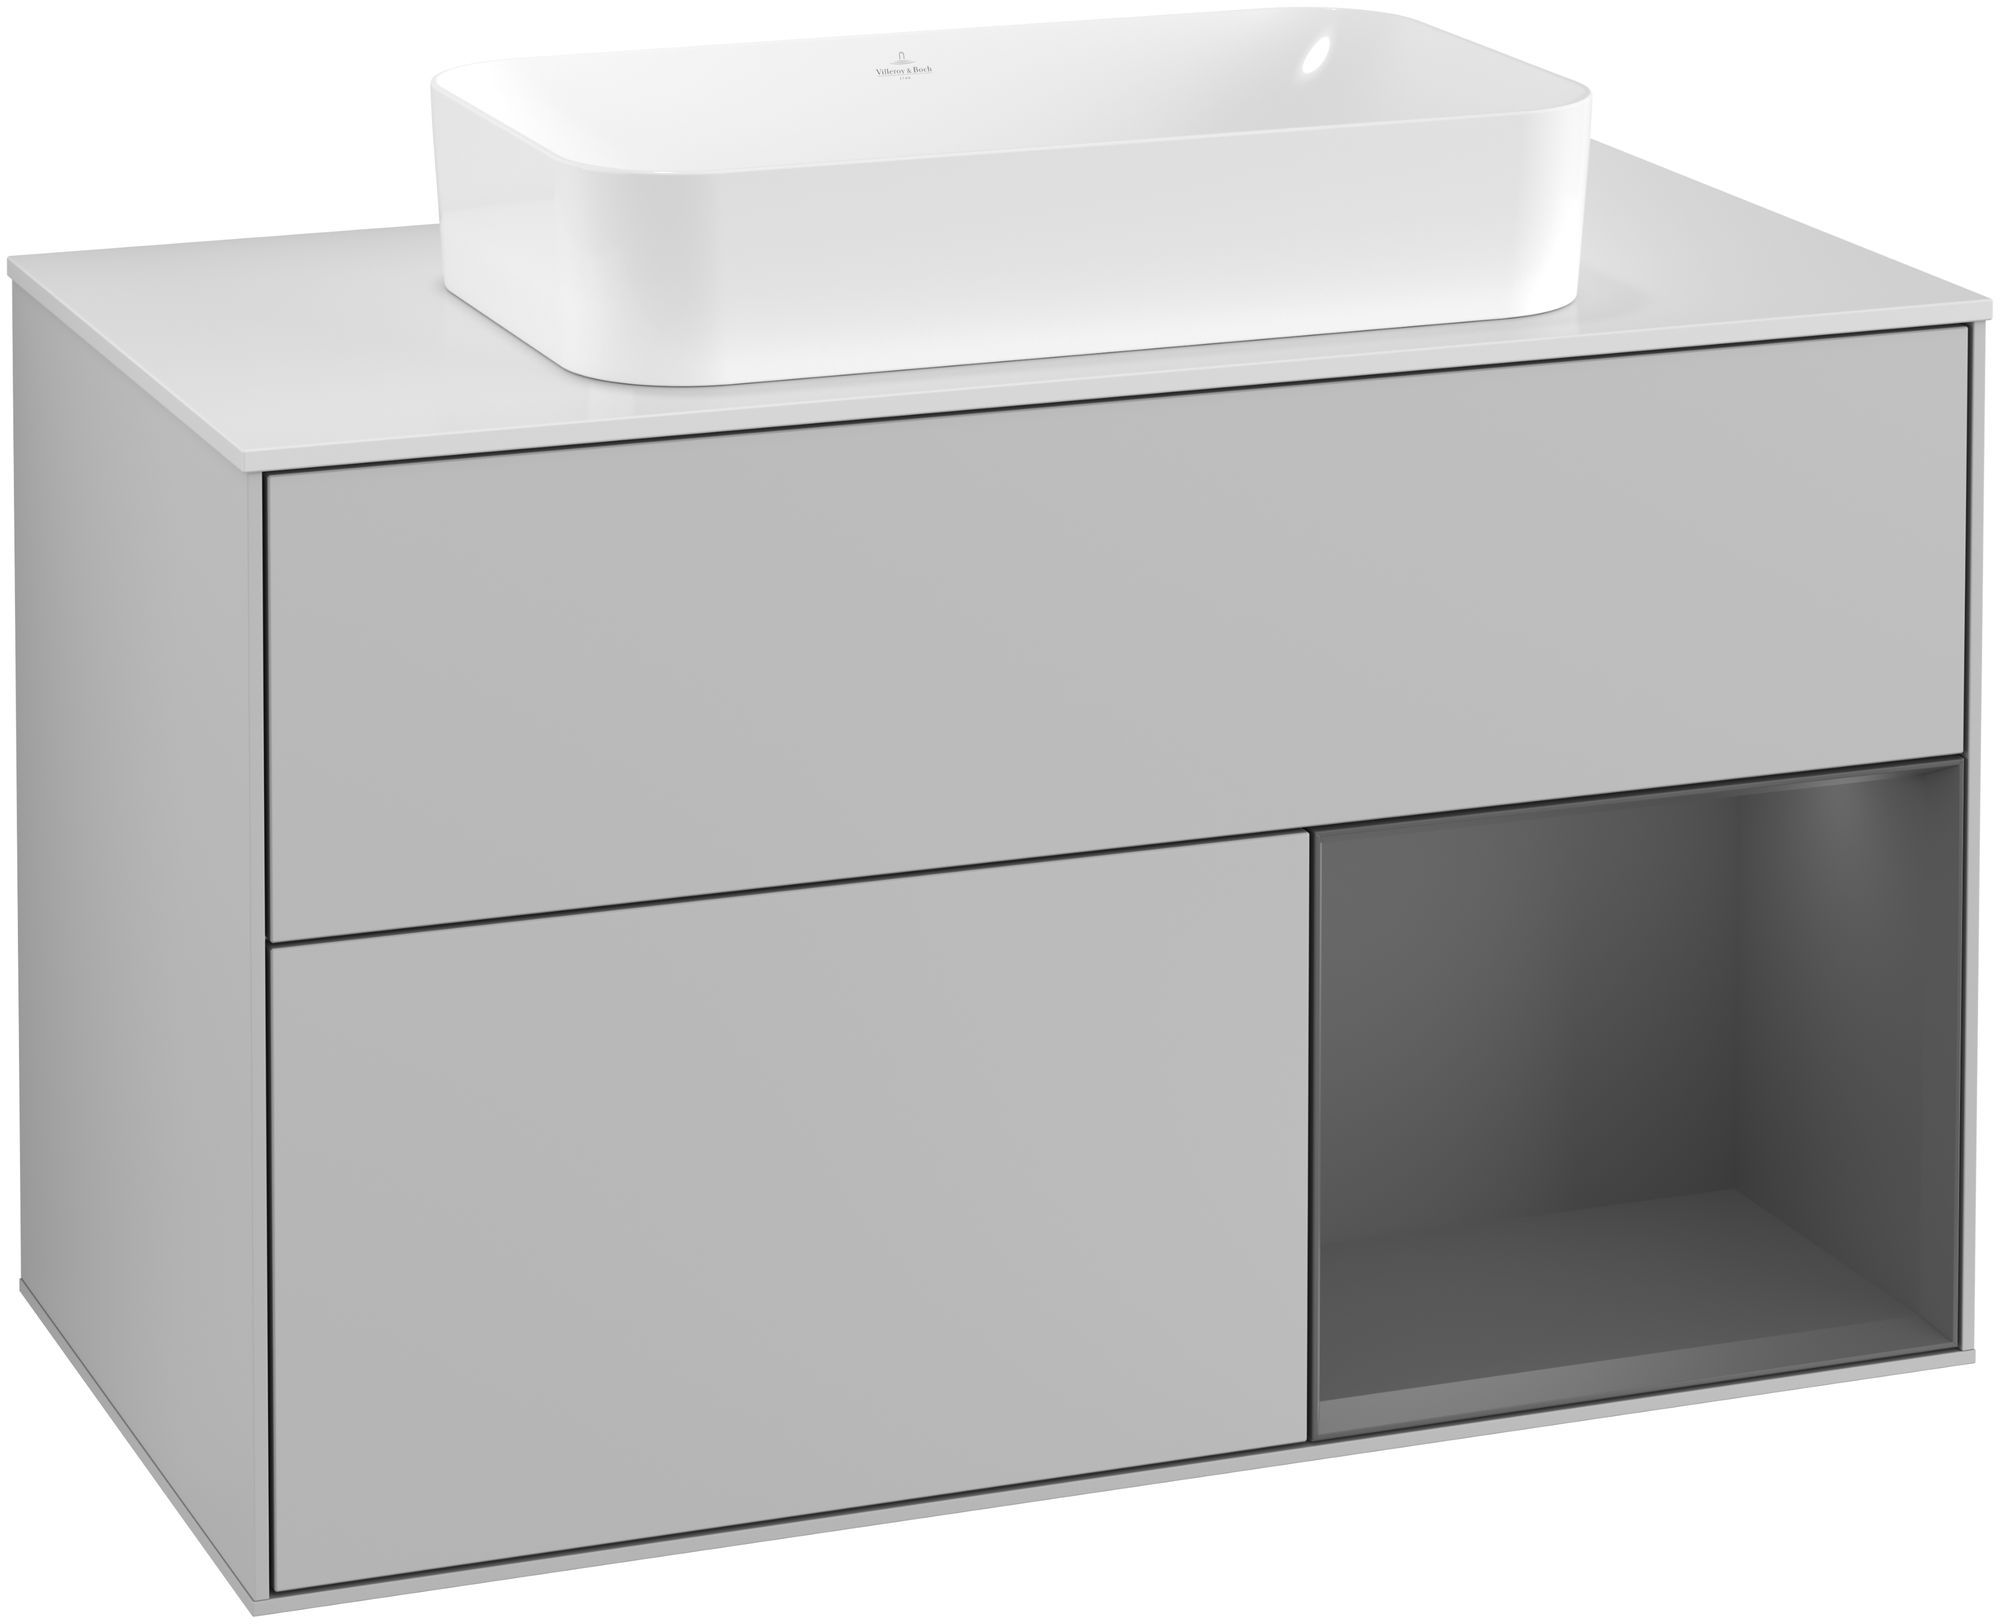 Villeroy & Boch Finion G25 Waschtischunterschrank mit Regalelement 2 Auszüge für WT mittig LED-Beleuchtung B:100xH:60,3xT:50,1cm Front, Korpus: Light Grey Matt, Regal: Anthracite Matt, Glasplatte: White Matt G251GKGJ